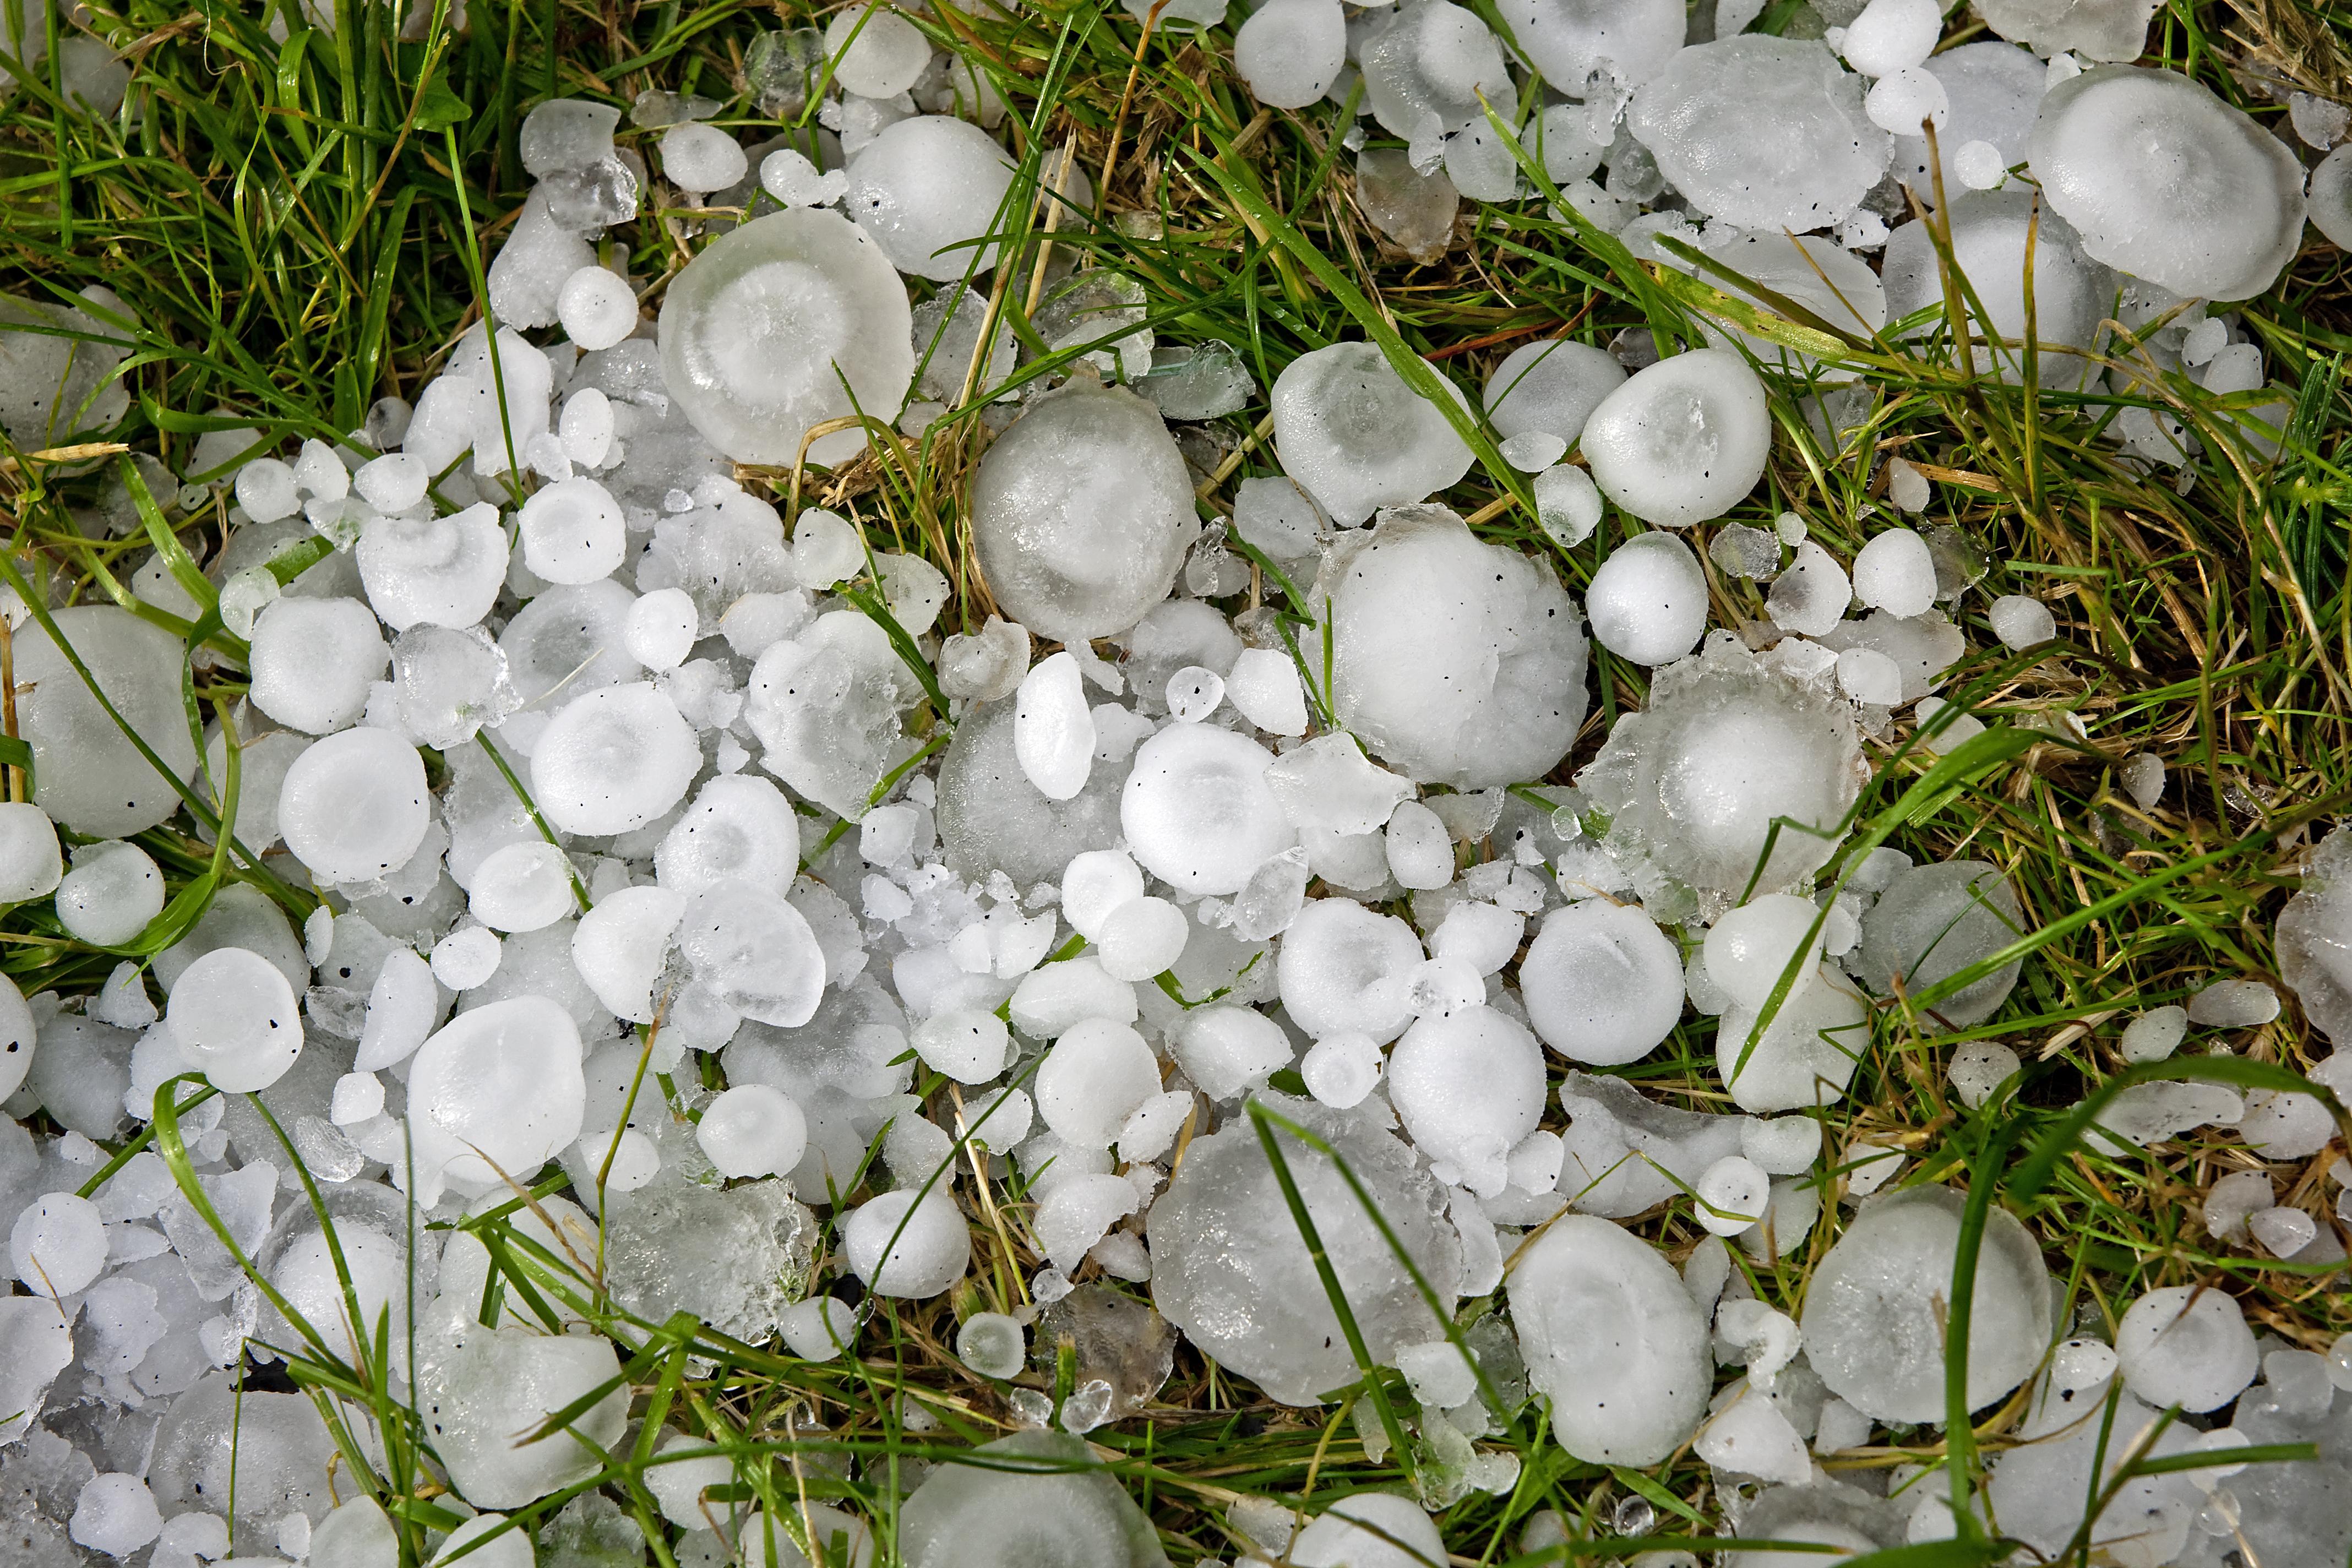 hail improving public understanding of insurance